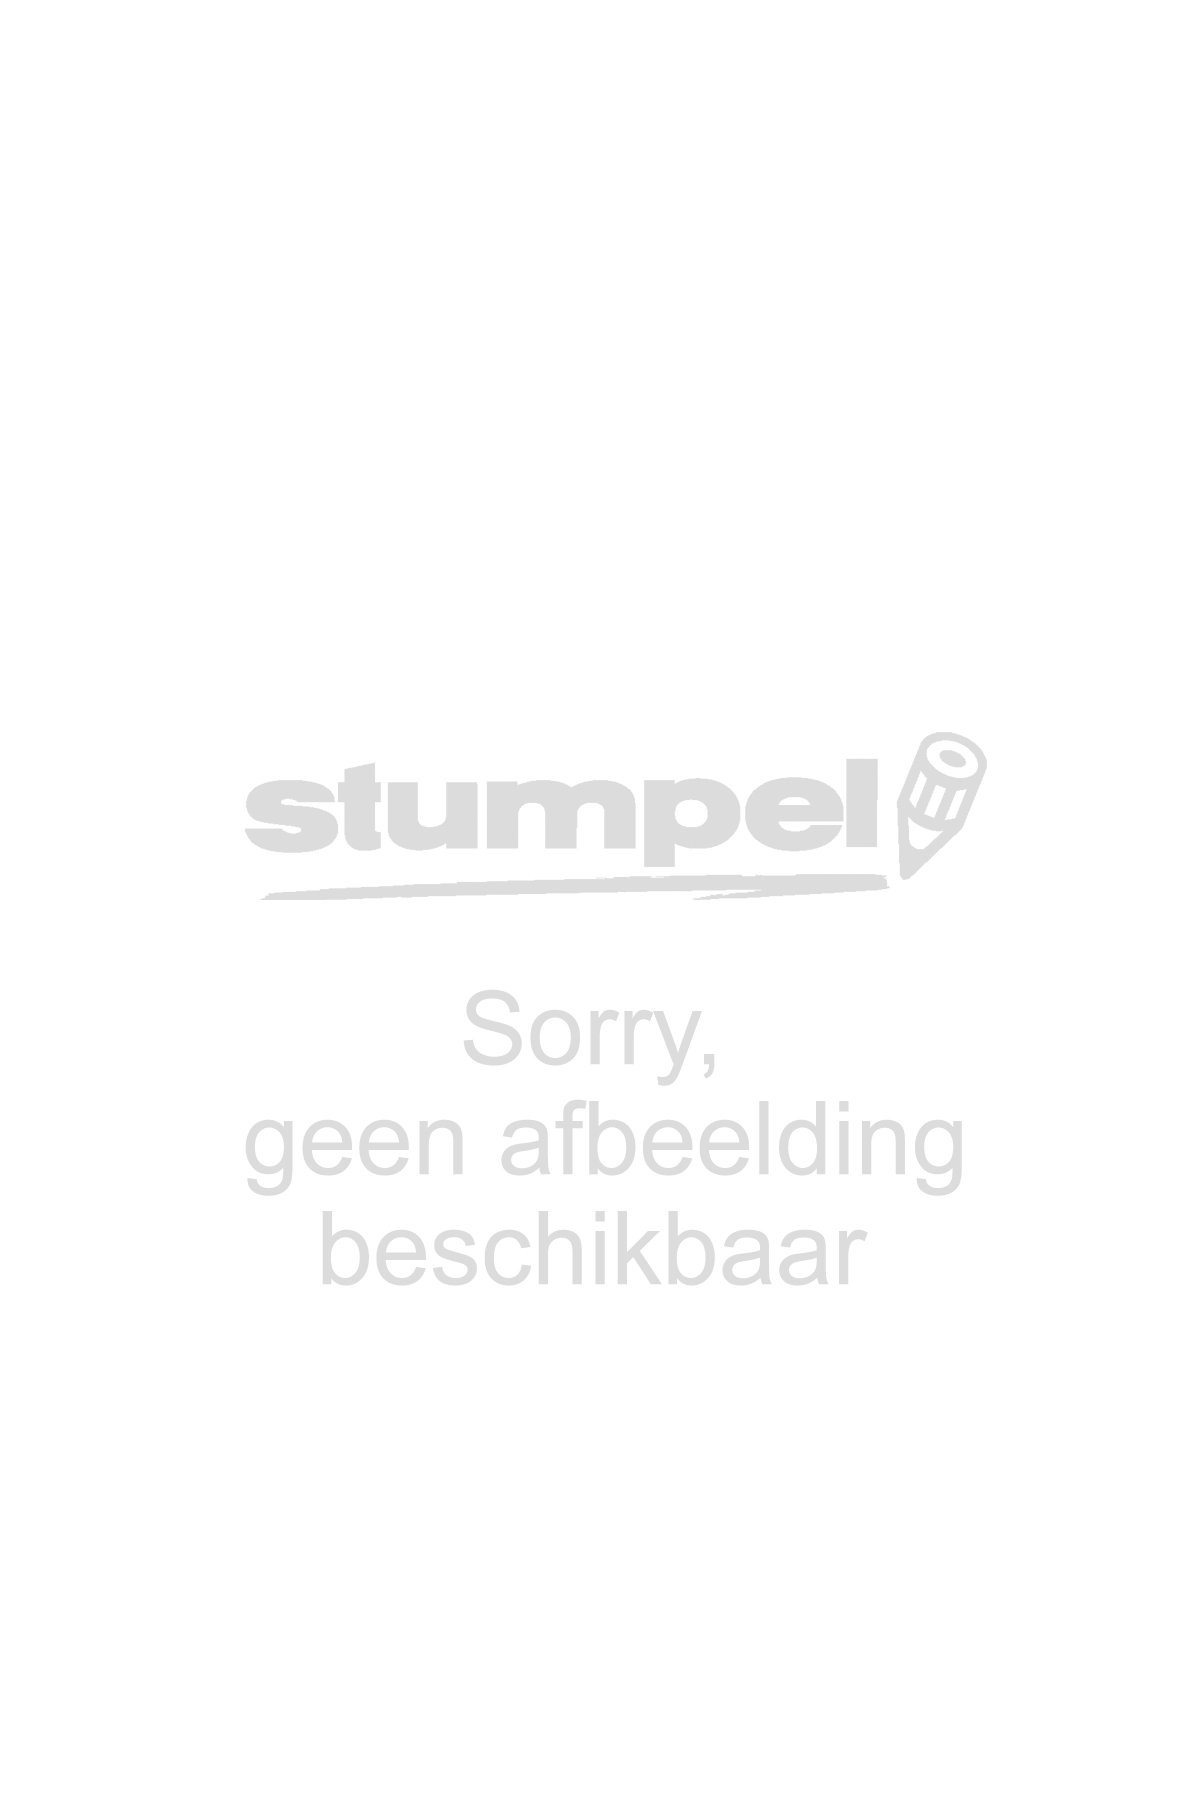 agenda-2022-ryam-weekplan-wit-nl-mundior-rood-11054098